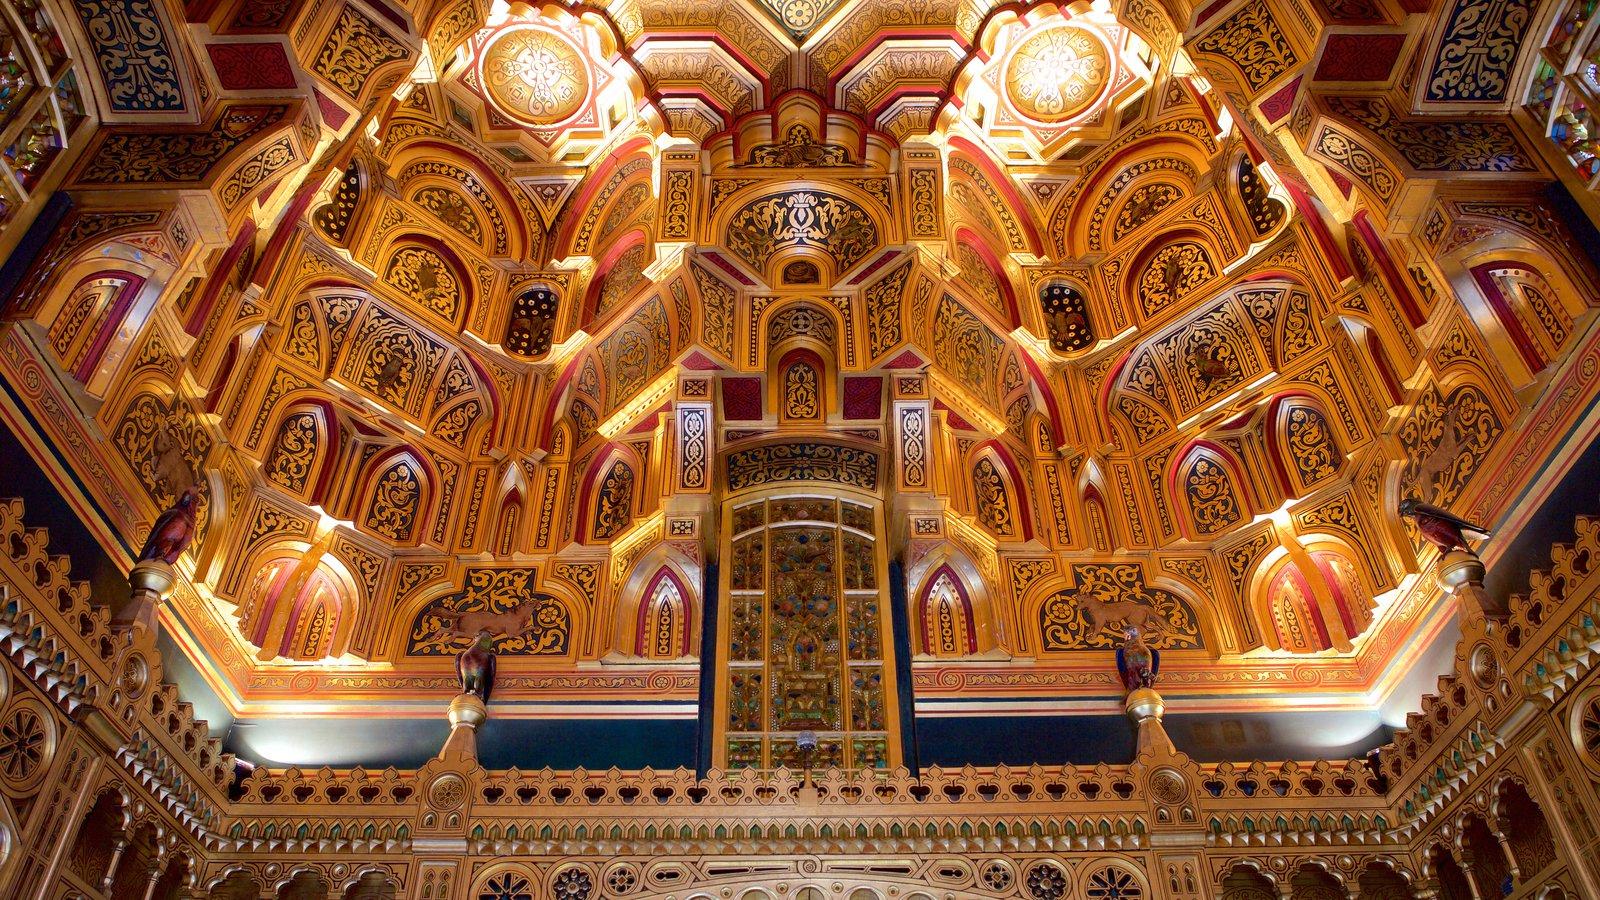 Castelo de Cardiff que inclui elementos de patrimônio, arquitetura de patrimônio e vistas internas